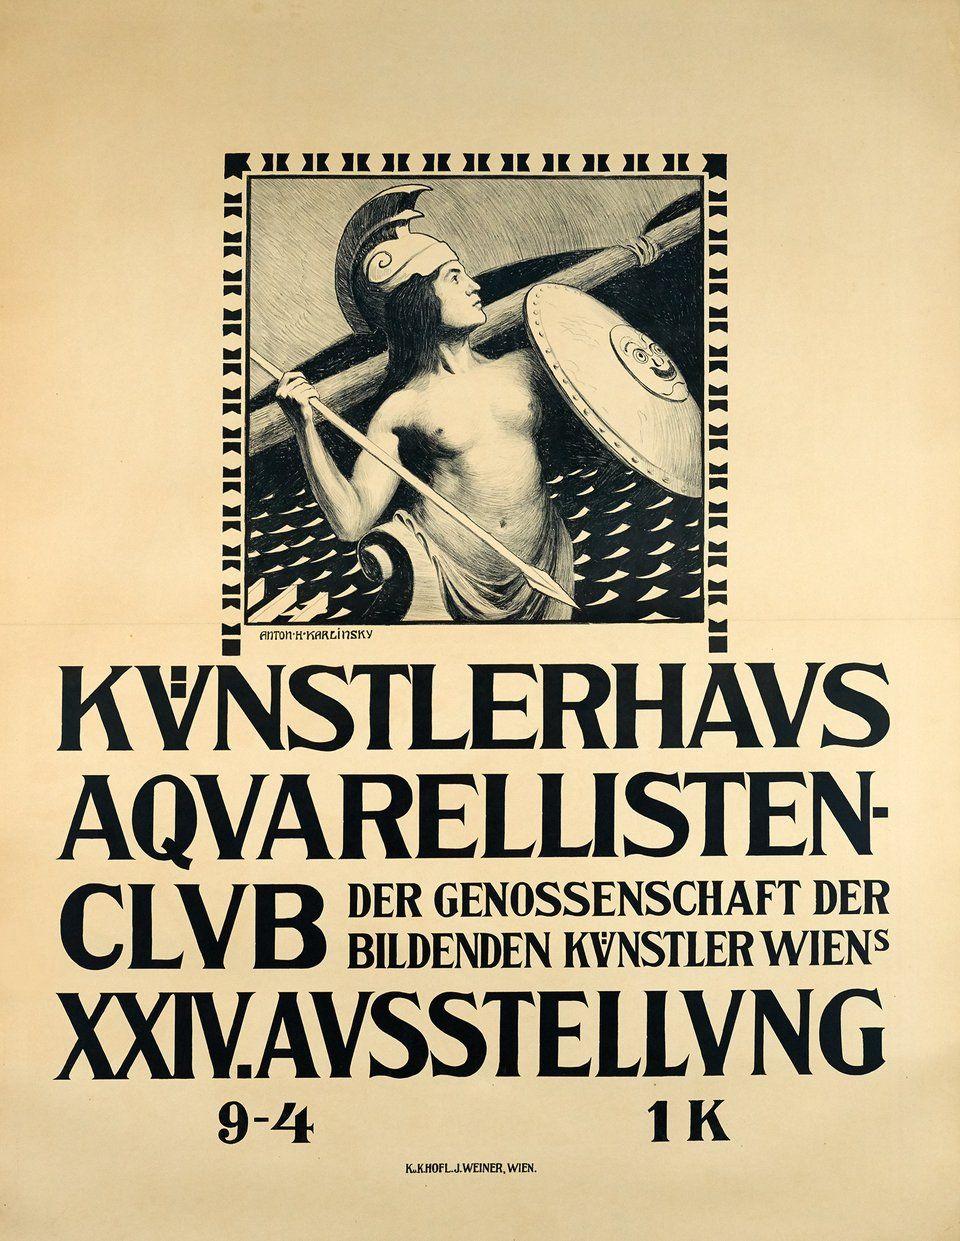 Vintage poster – Aquarellisten Club, Kunstlerhaus